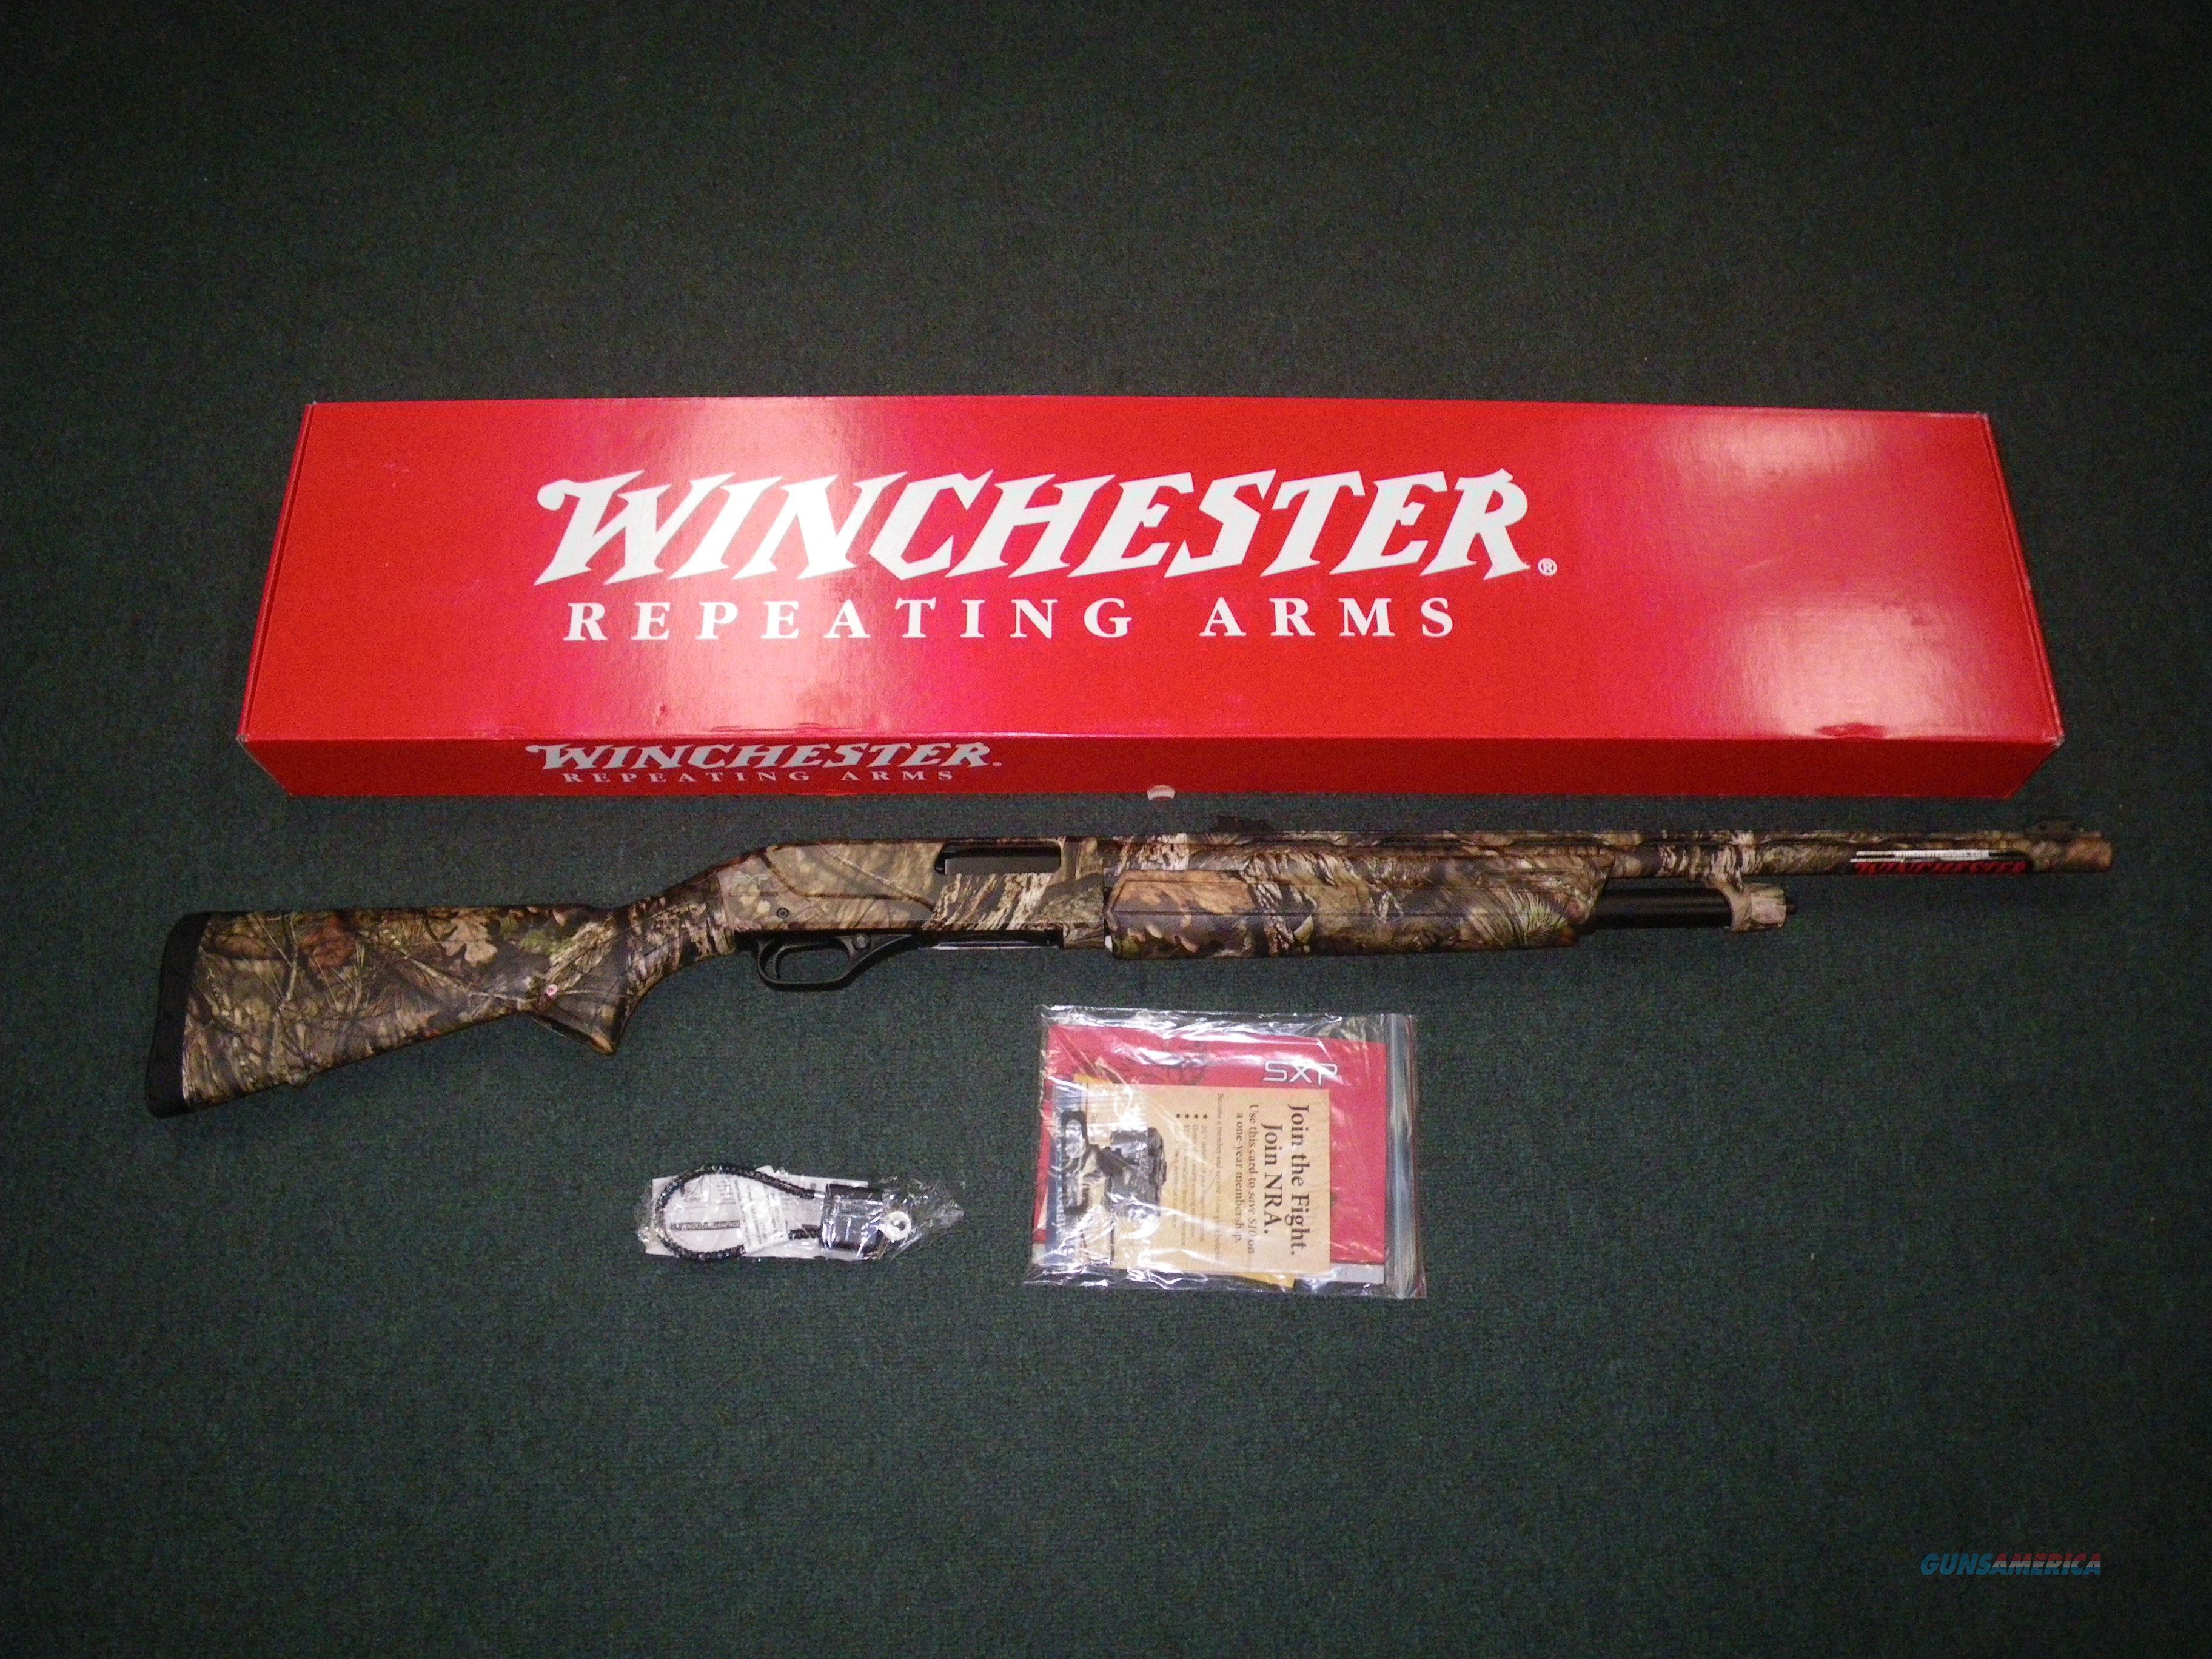 "Winchester SXP Turkey Hunter 20ga 24"" NEW 3"" Chmbr #512307690  Guns > Shotguns > Winchester Shotguns - Modern > Pump Action > Hunting"